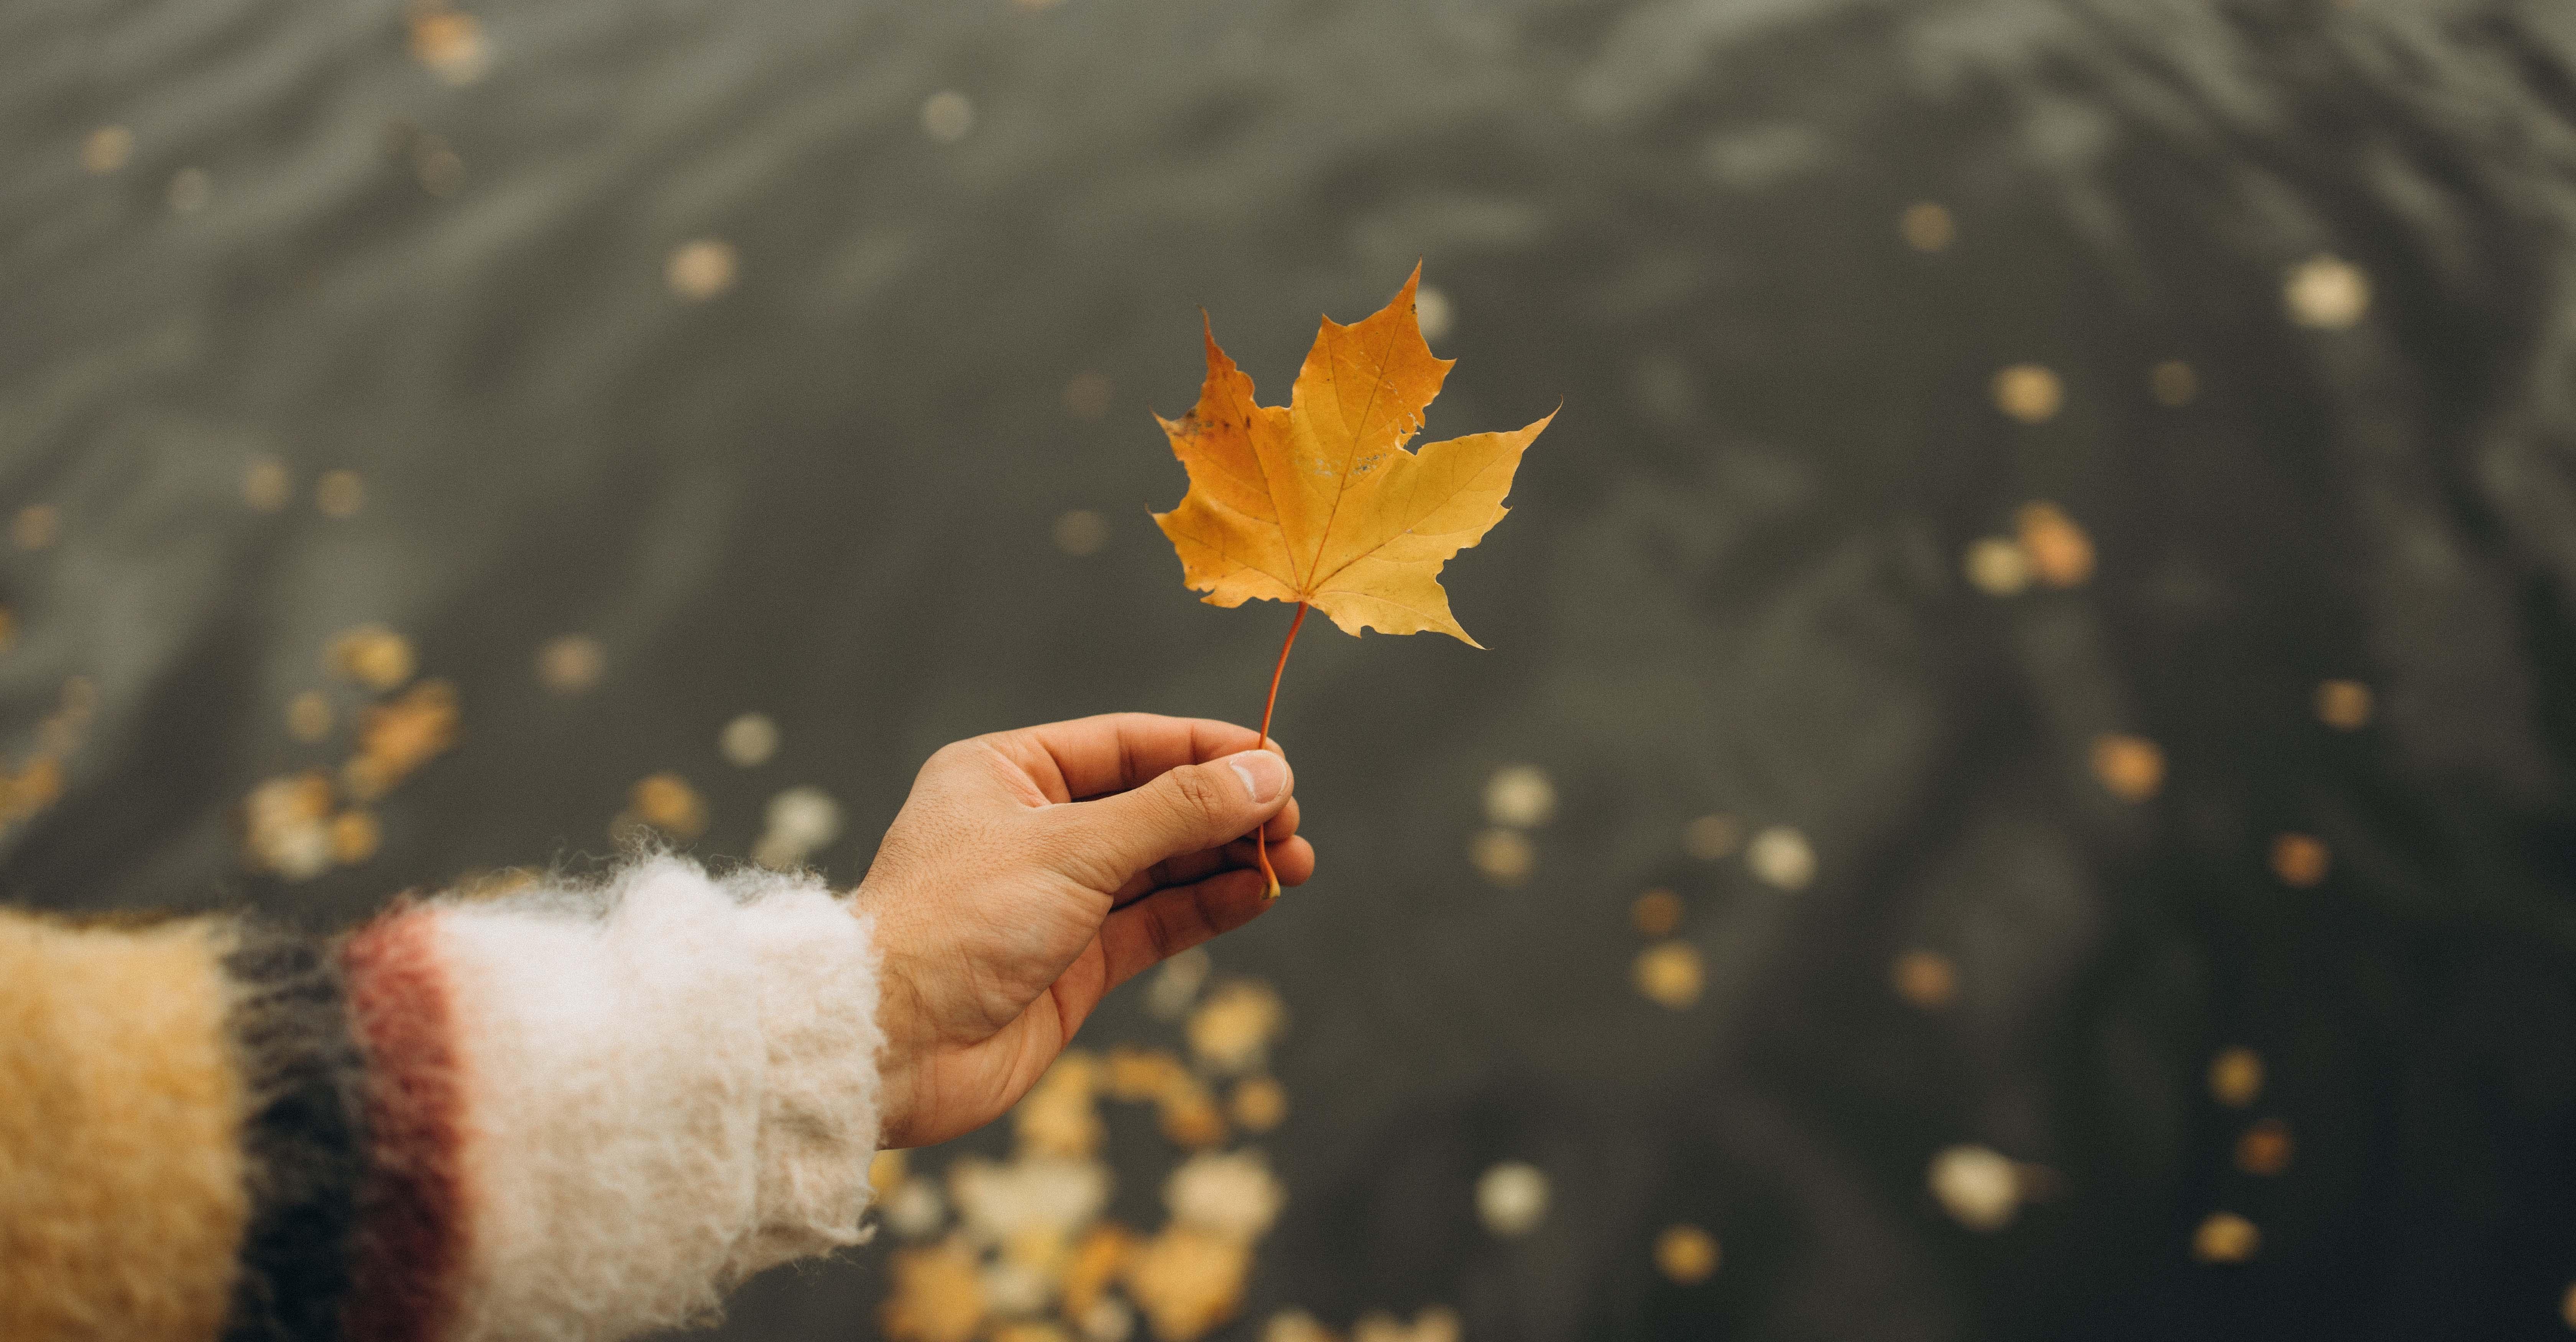 Fall Leaf Cozy Sweater Winter Water